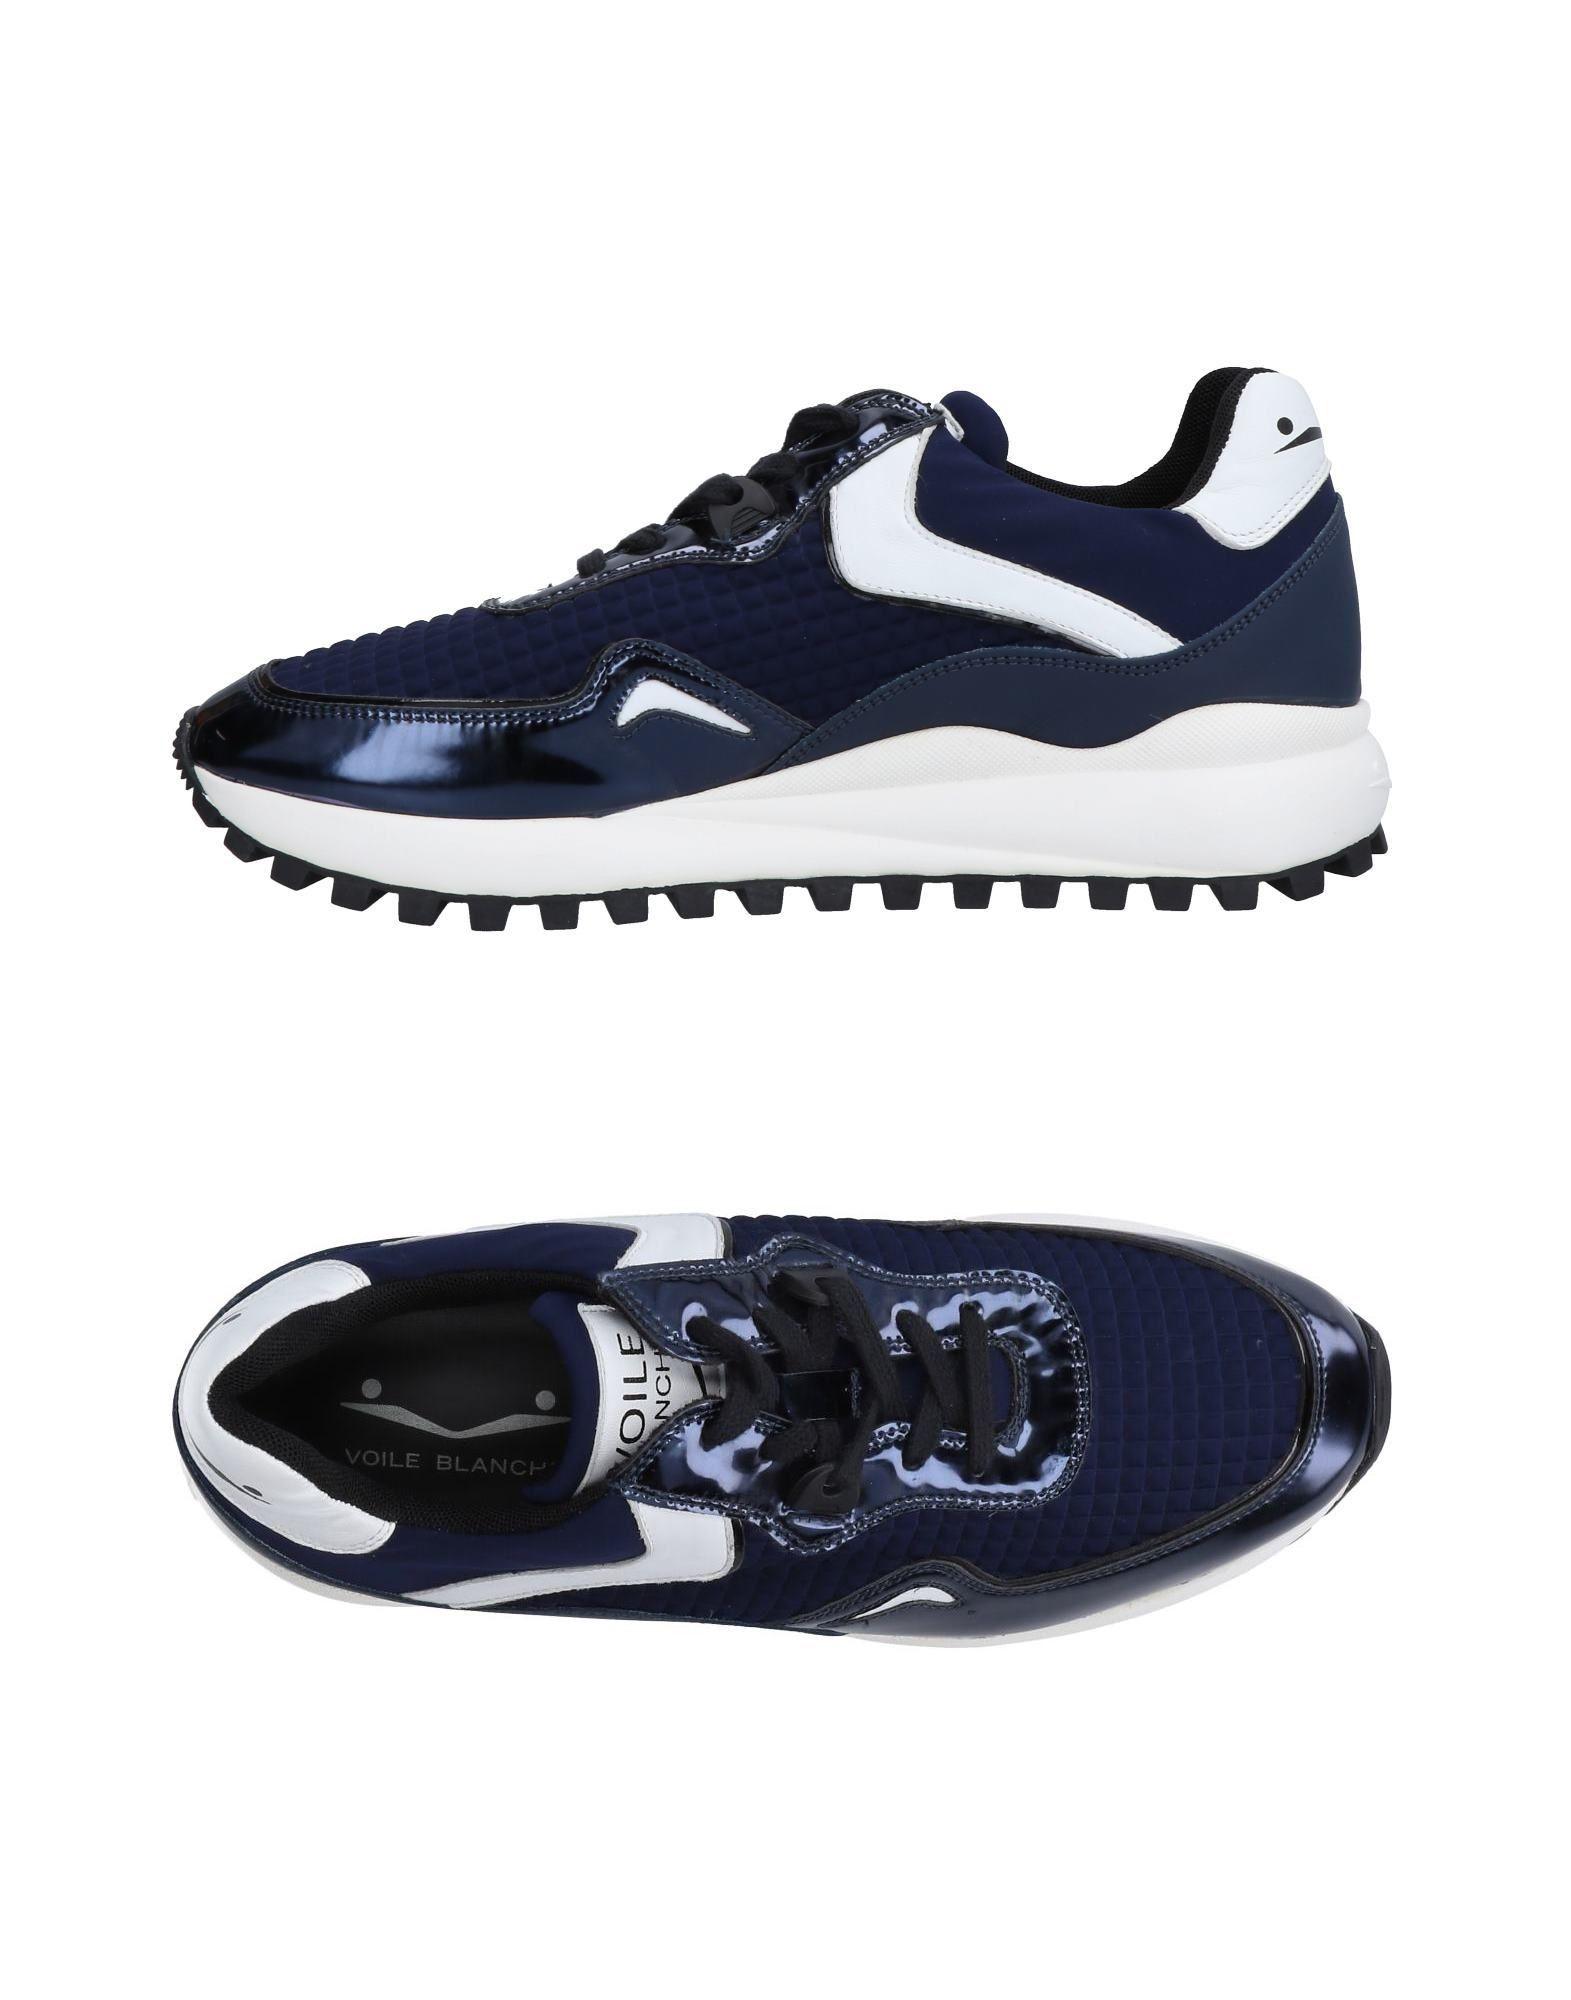 Voile Blanche Sneakers Herren  11507838HN Gute Qualität beliebte Schuhe